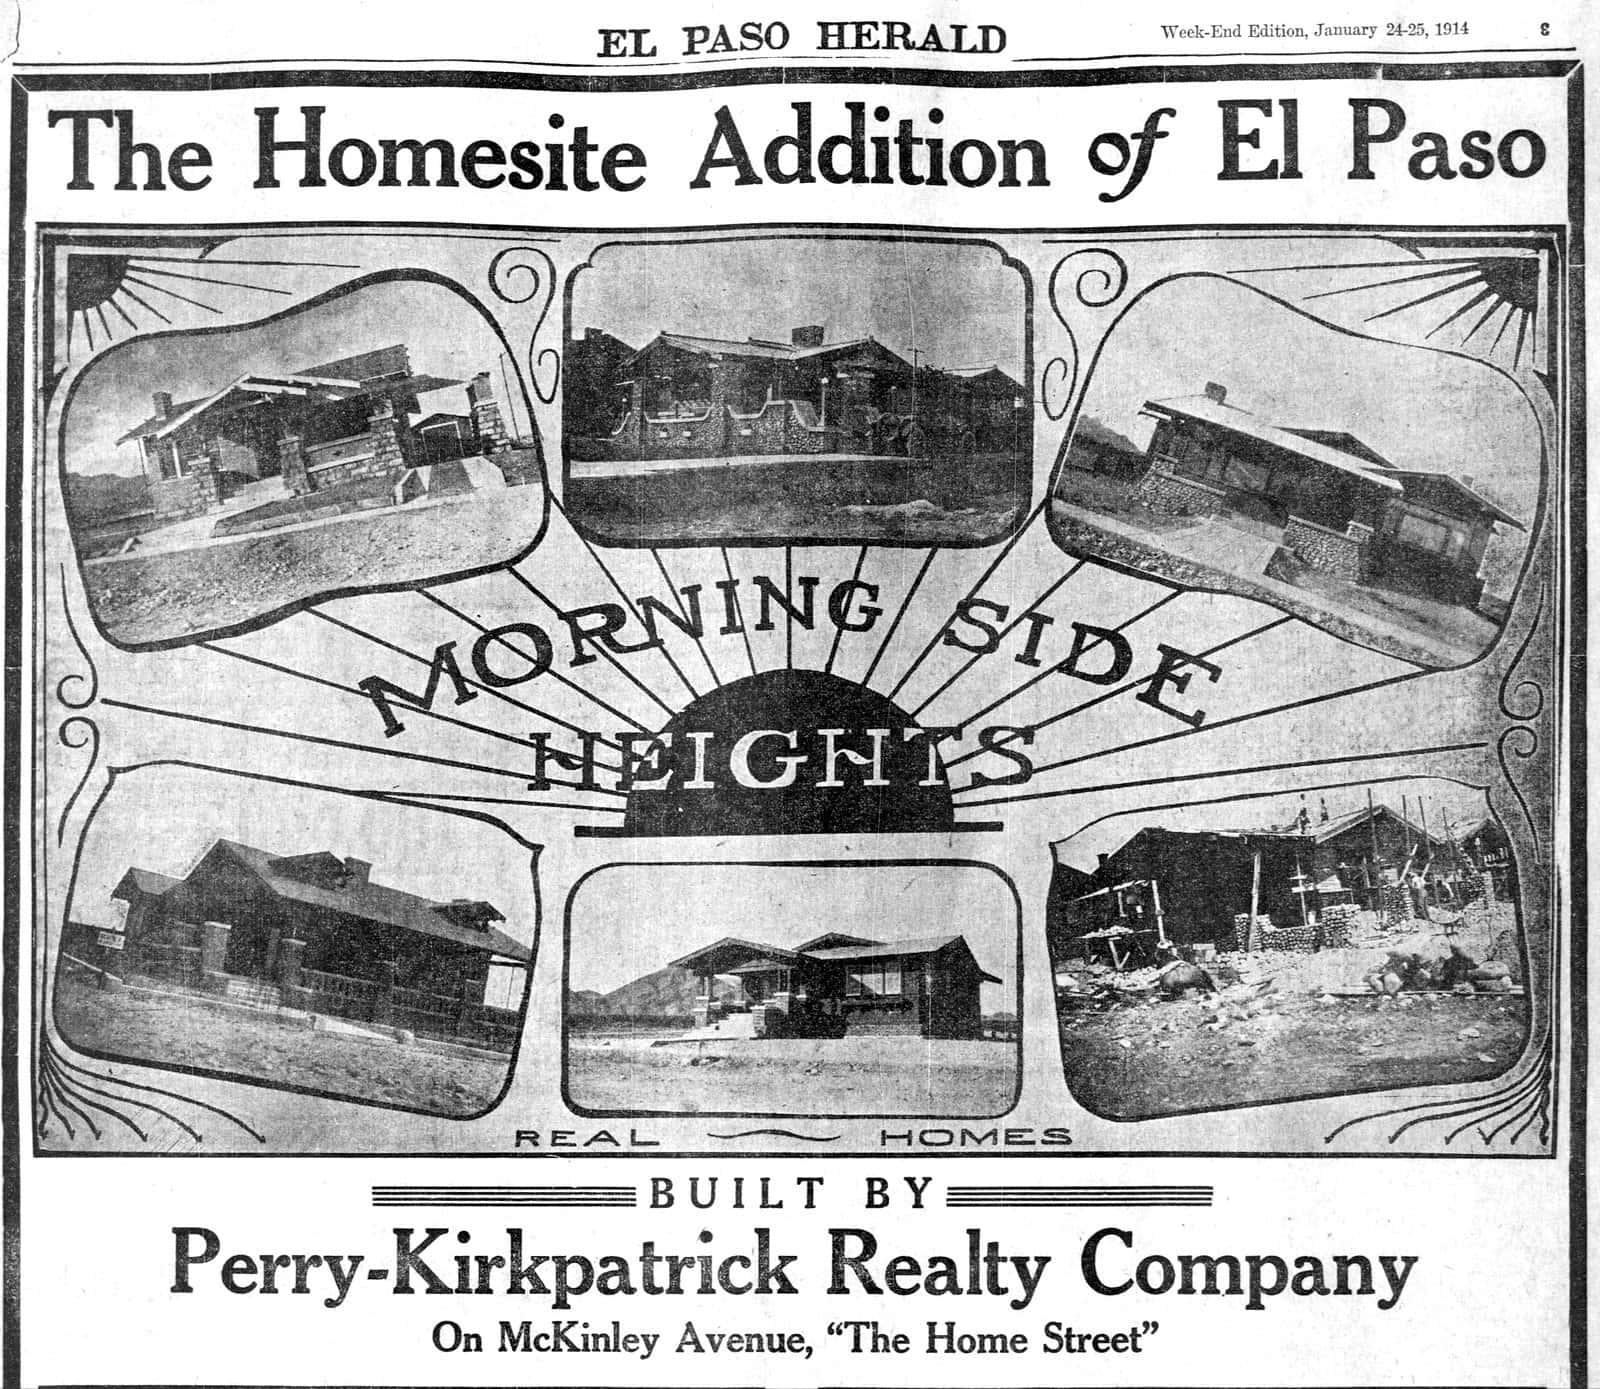 Morningside Heights - El Paso Texas (January 1914)